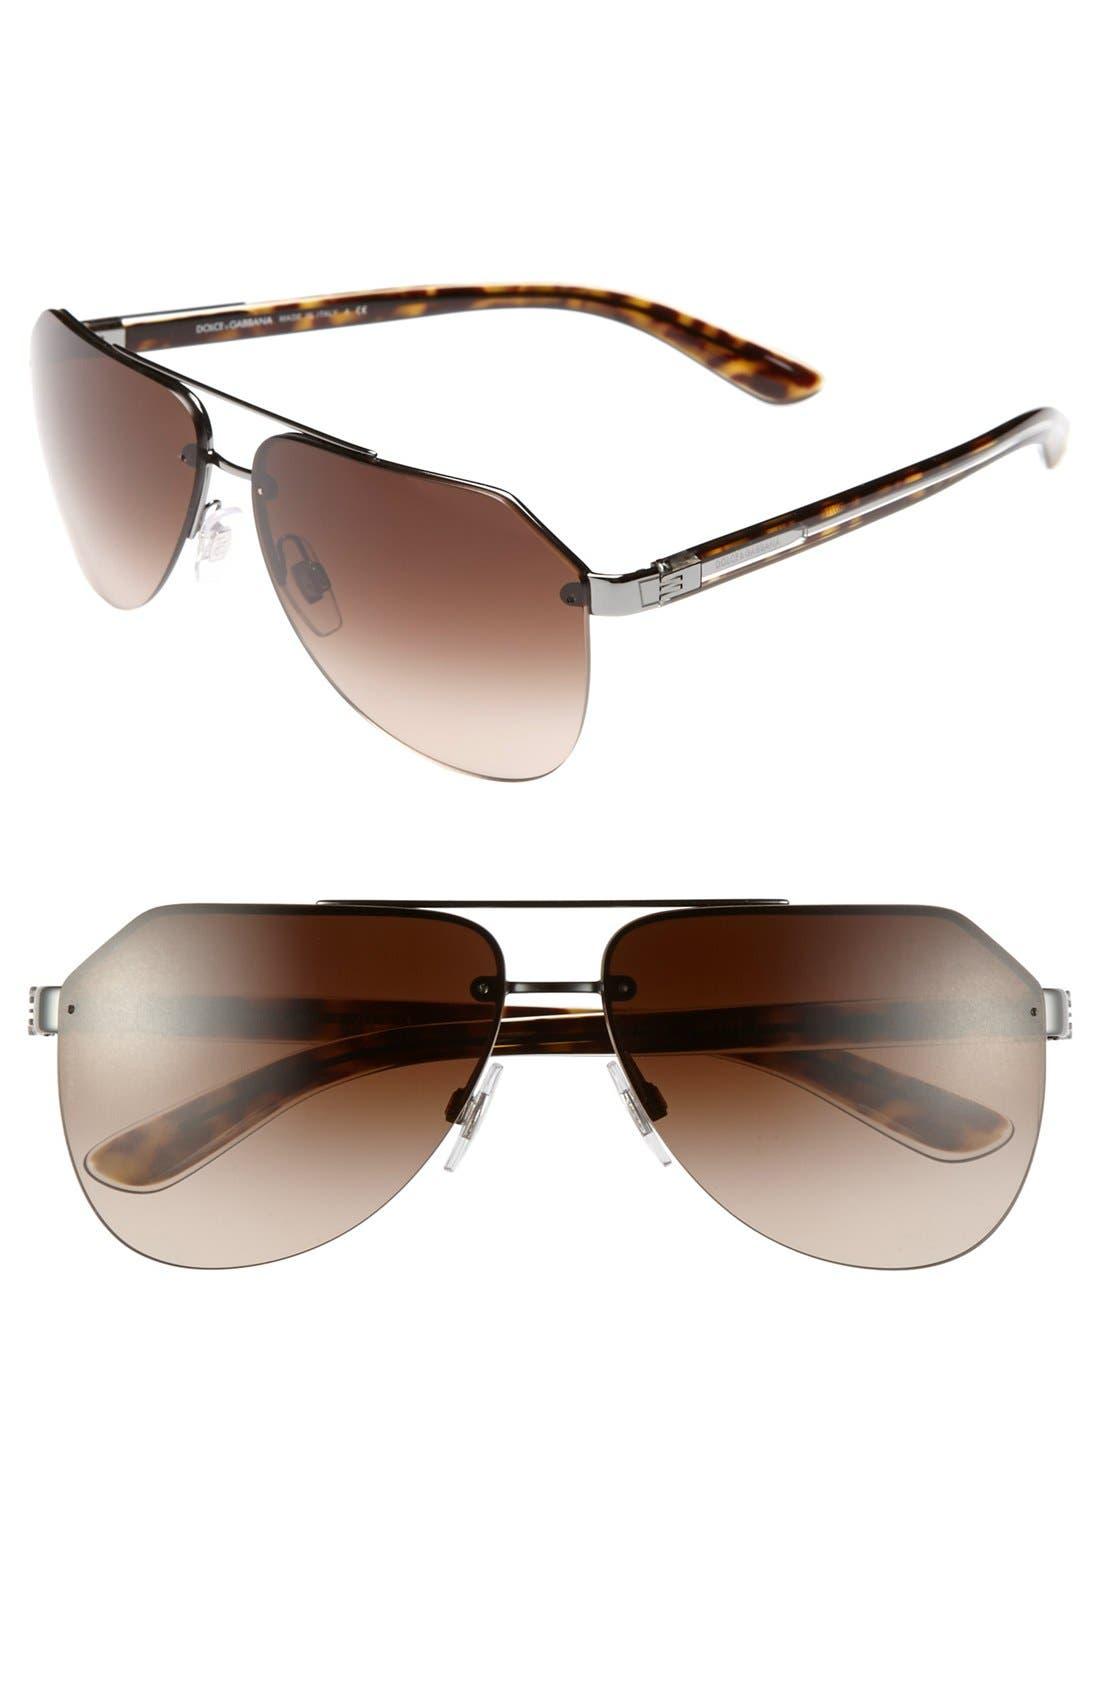 Alternate Image 1 Selected - Dolce&Gabbana 61mm Polarized Rimless Aviator Sunglasses